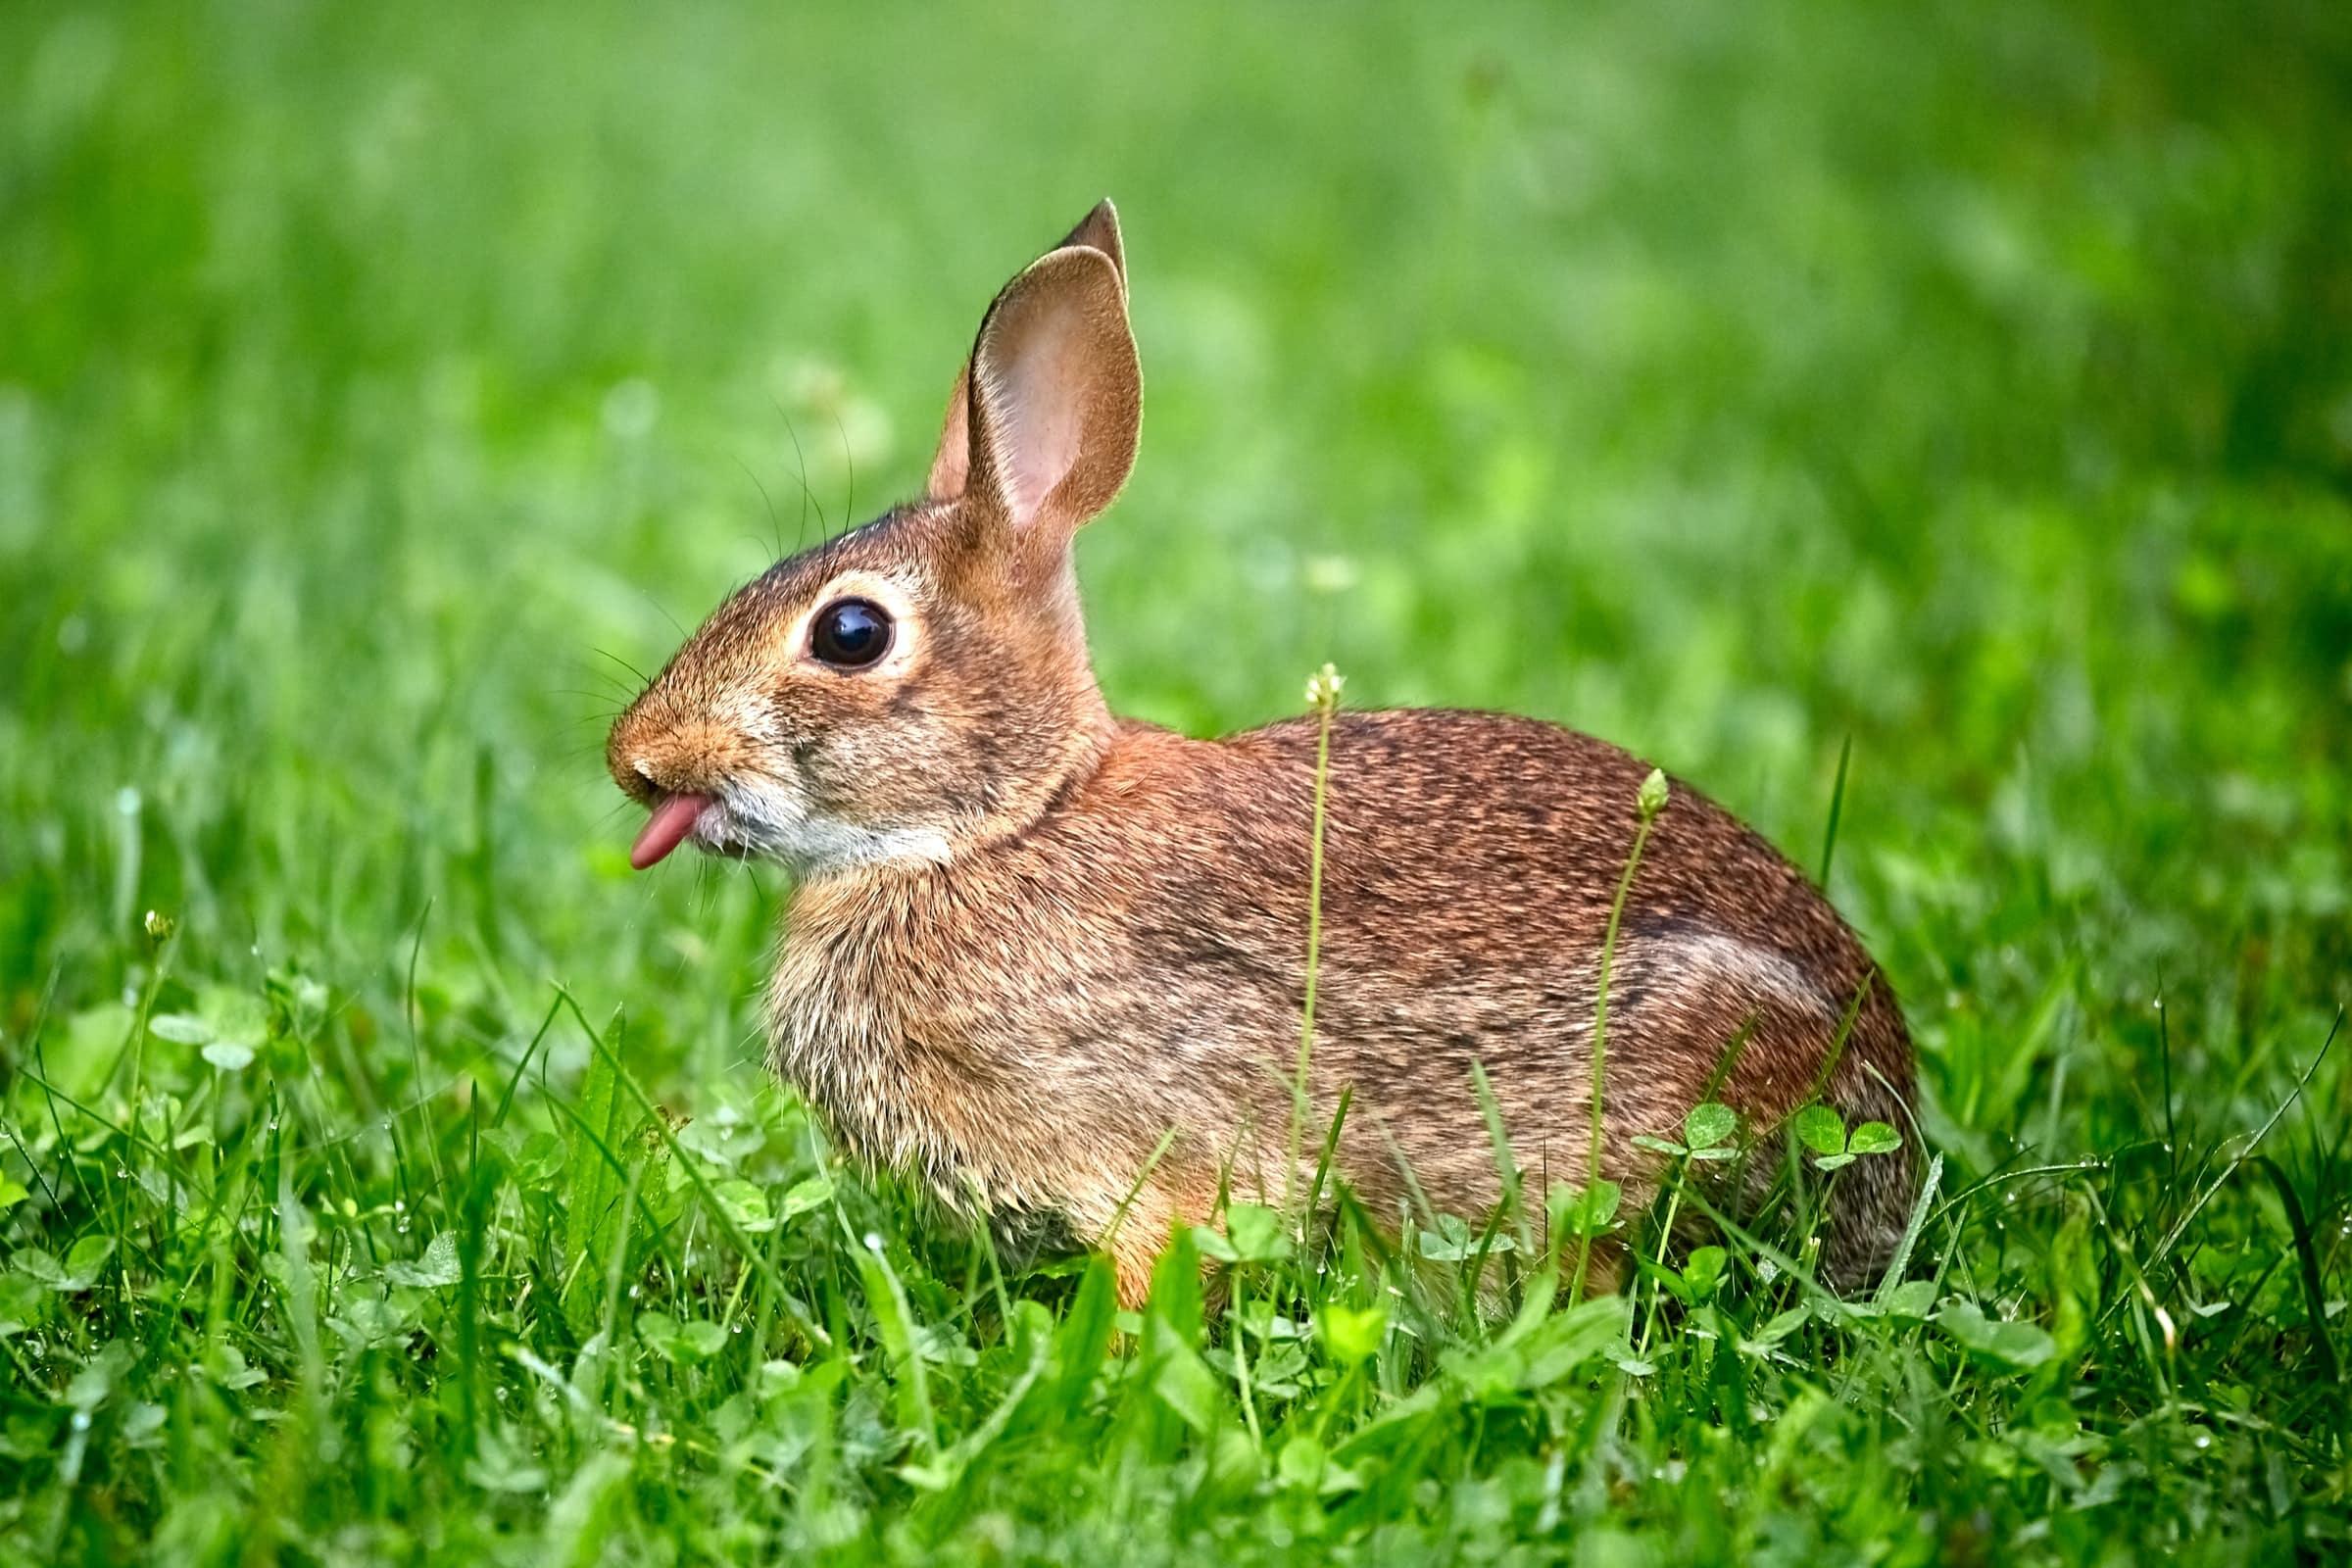 How to Discipline a Rabbit